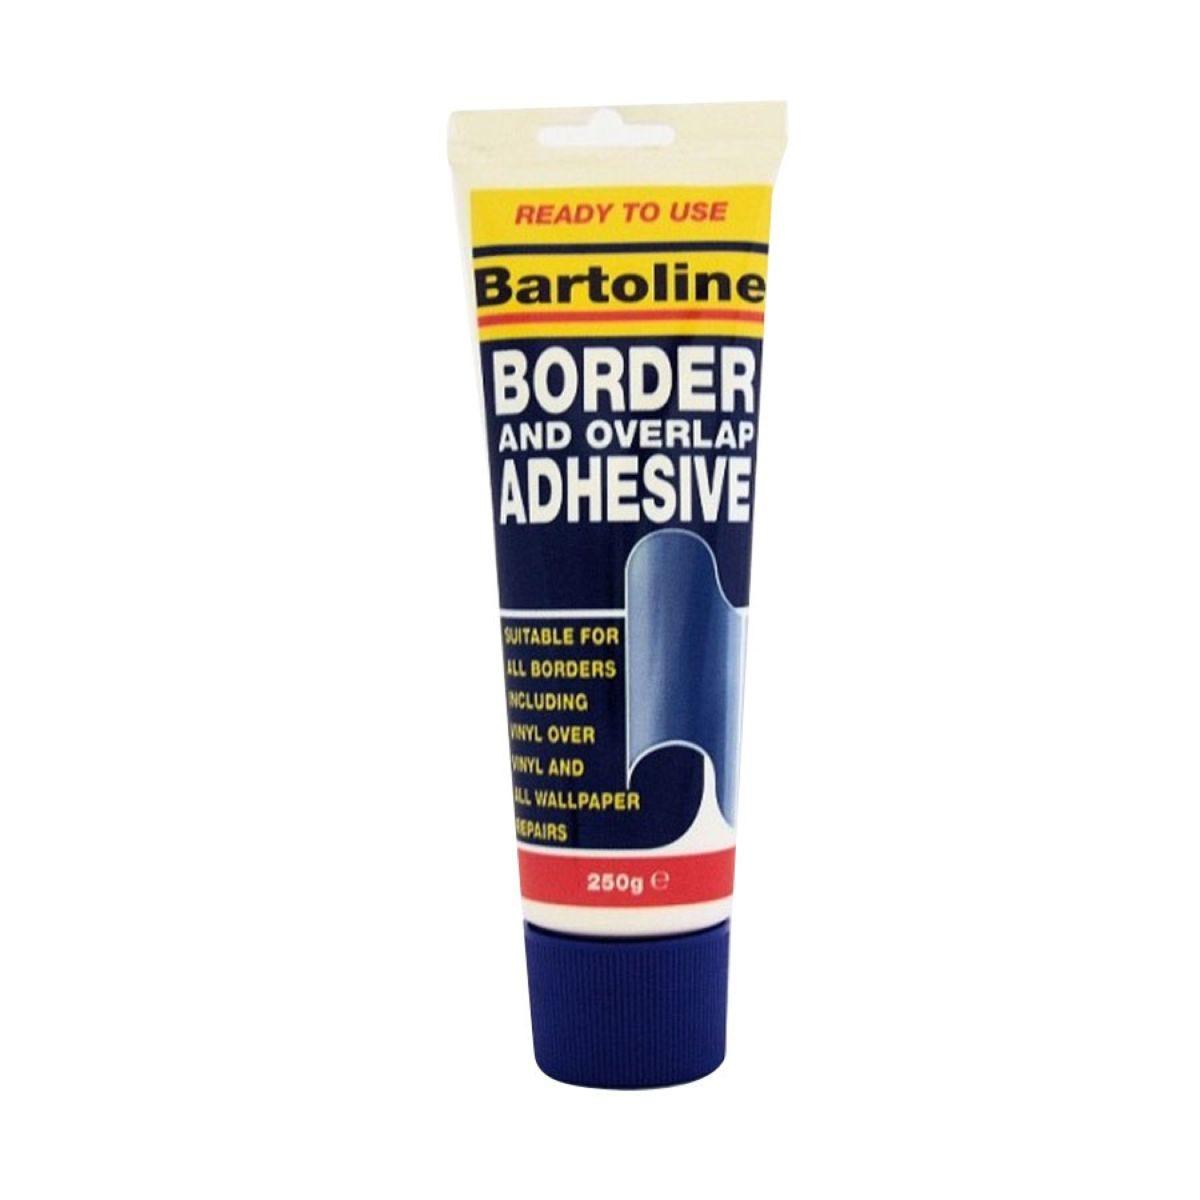 Bartoline Border And Overlap Adhesive 250g